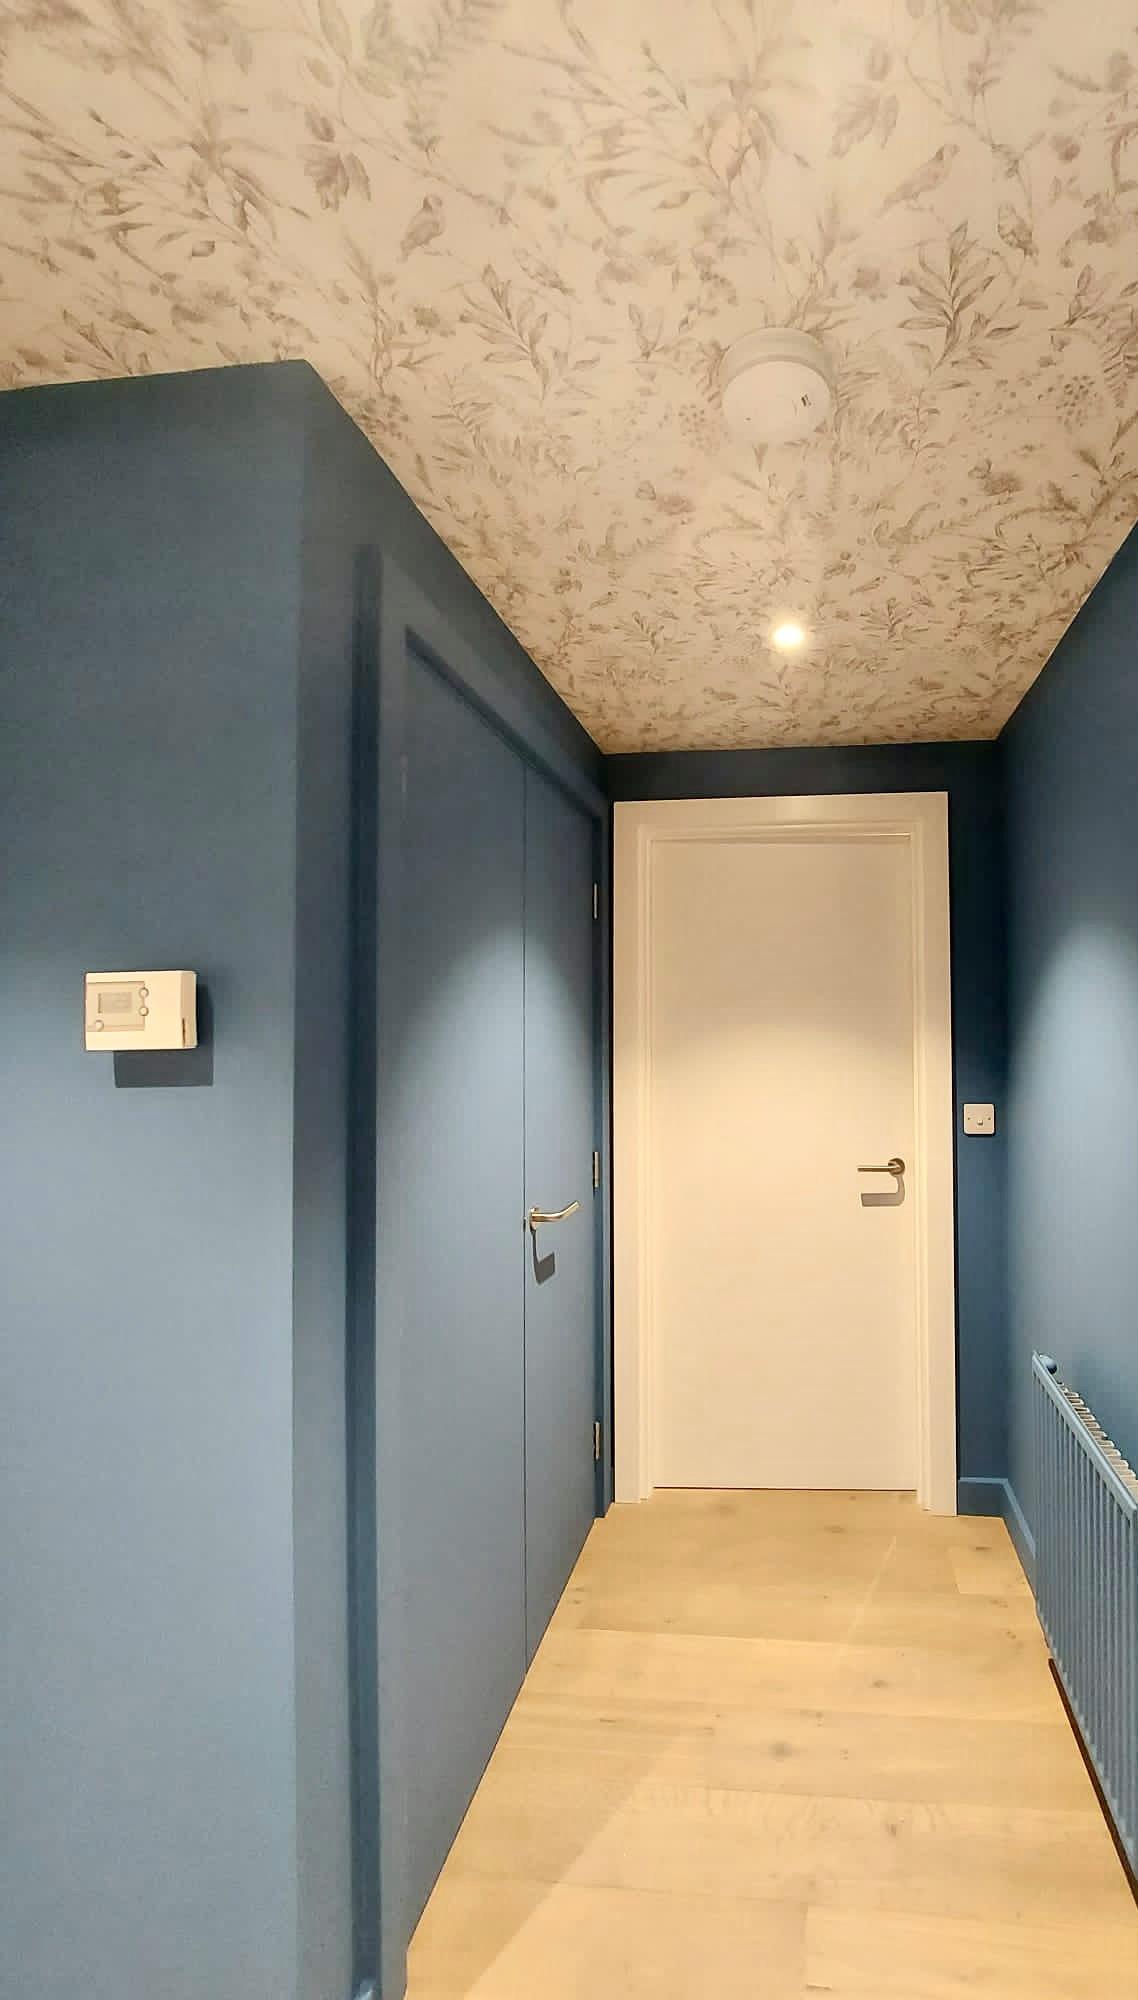 Colour scheme and materials consultation